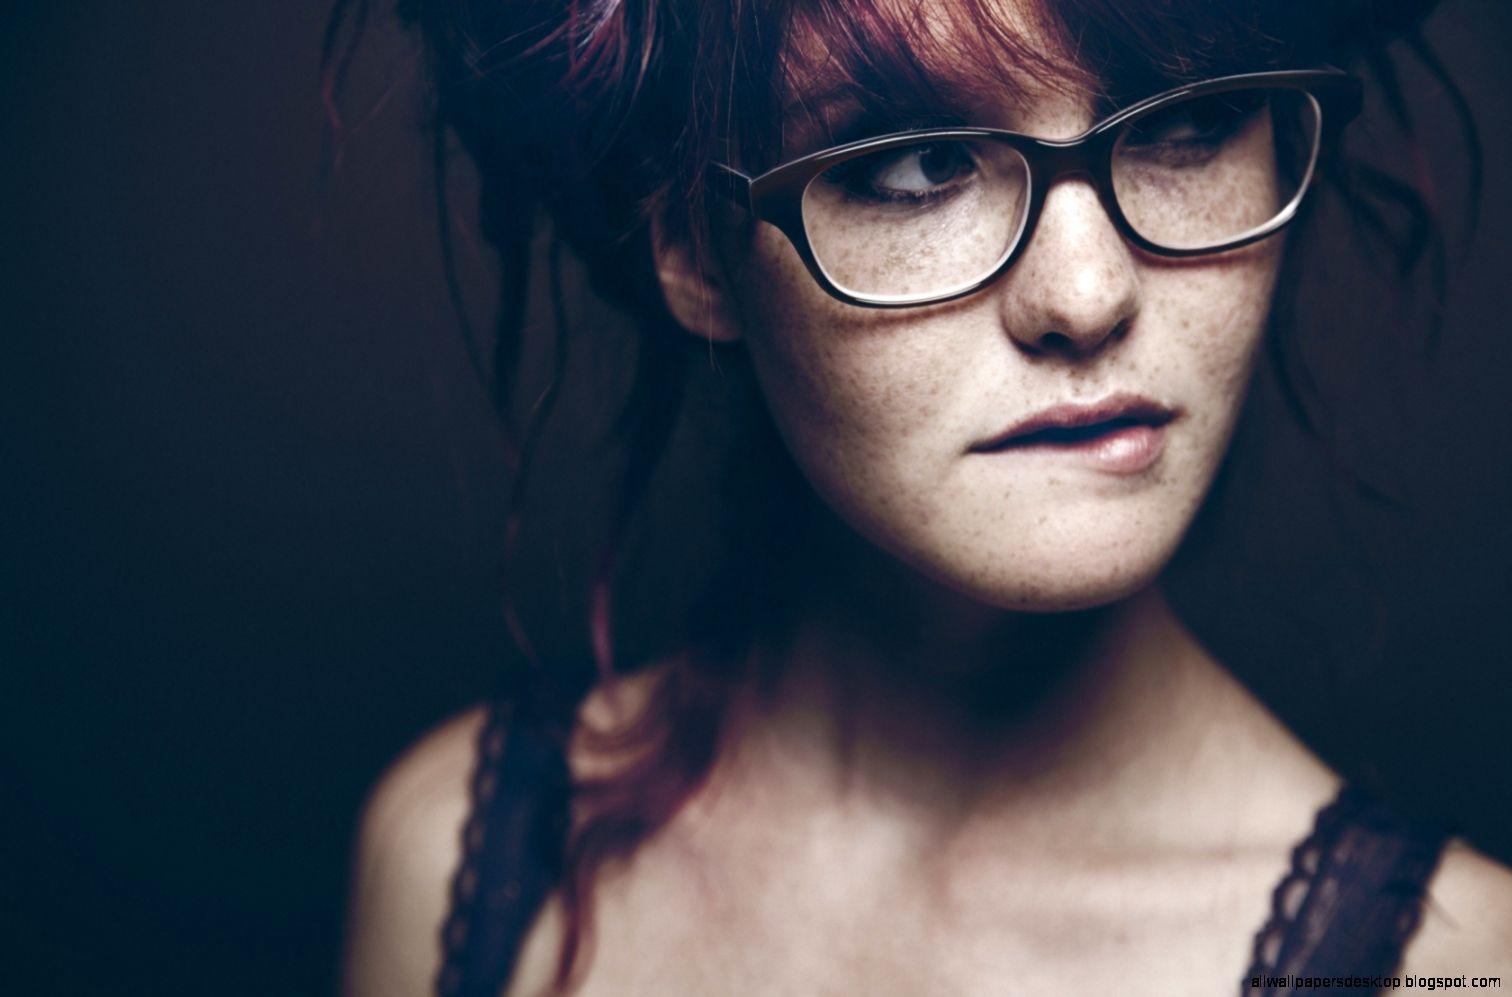 Download Wallpaper 1680x1050 Redhead Girl Glasses Eyes